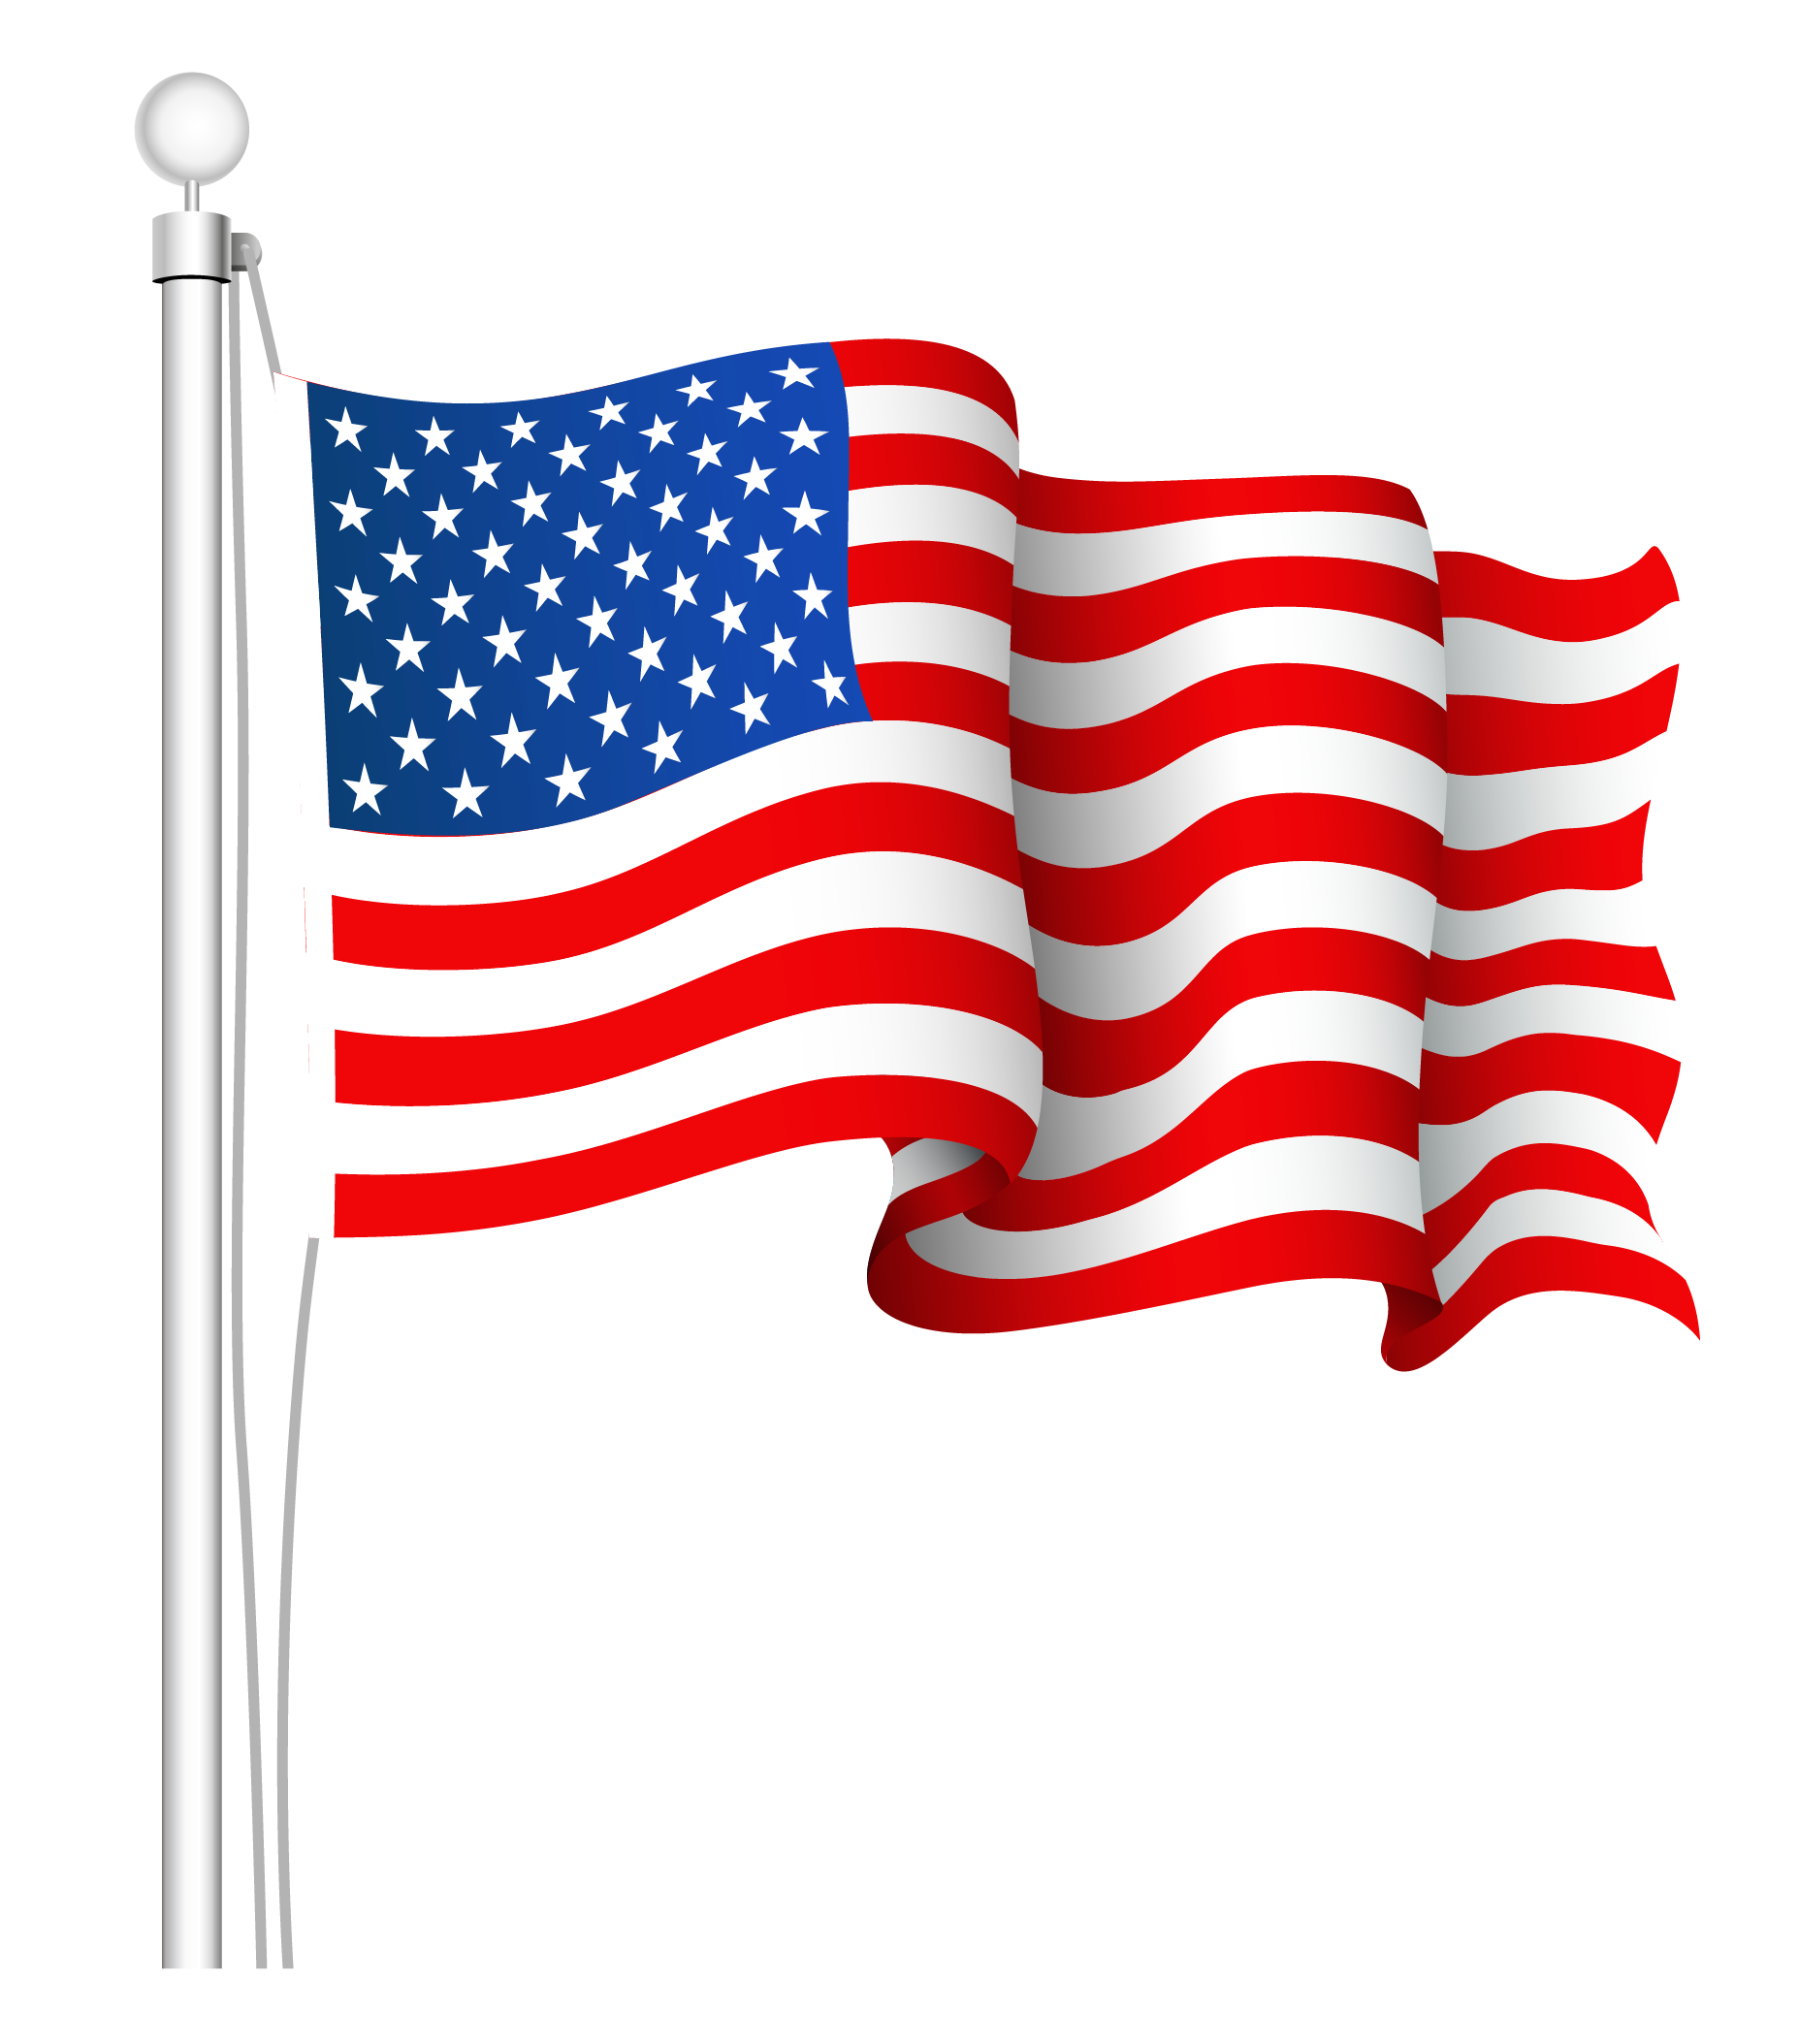 United States Flag Clip Art Cliparts Co-United States Flag Clip Art Cliparts Co-12